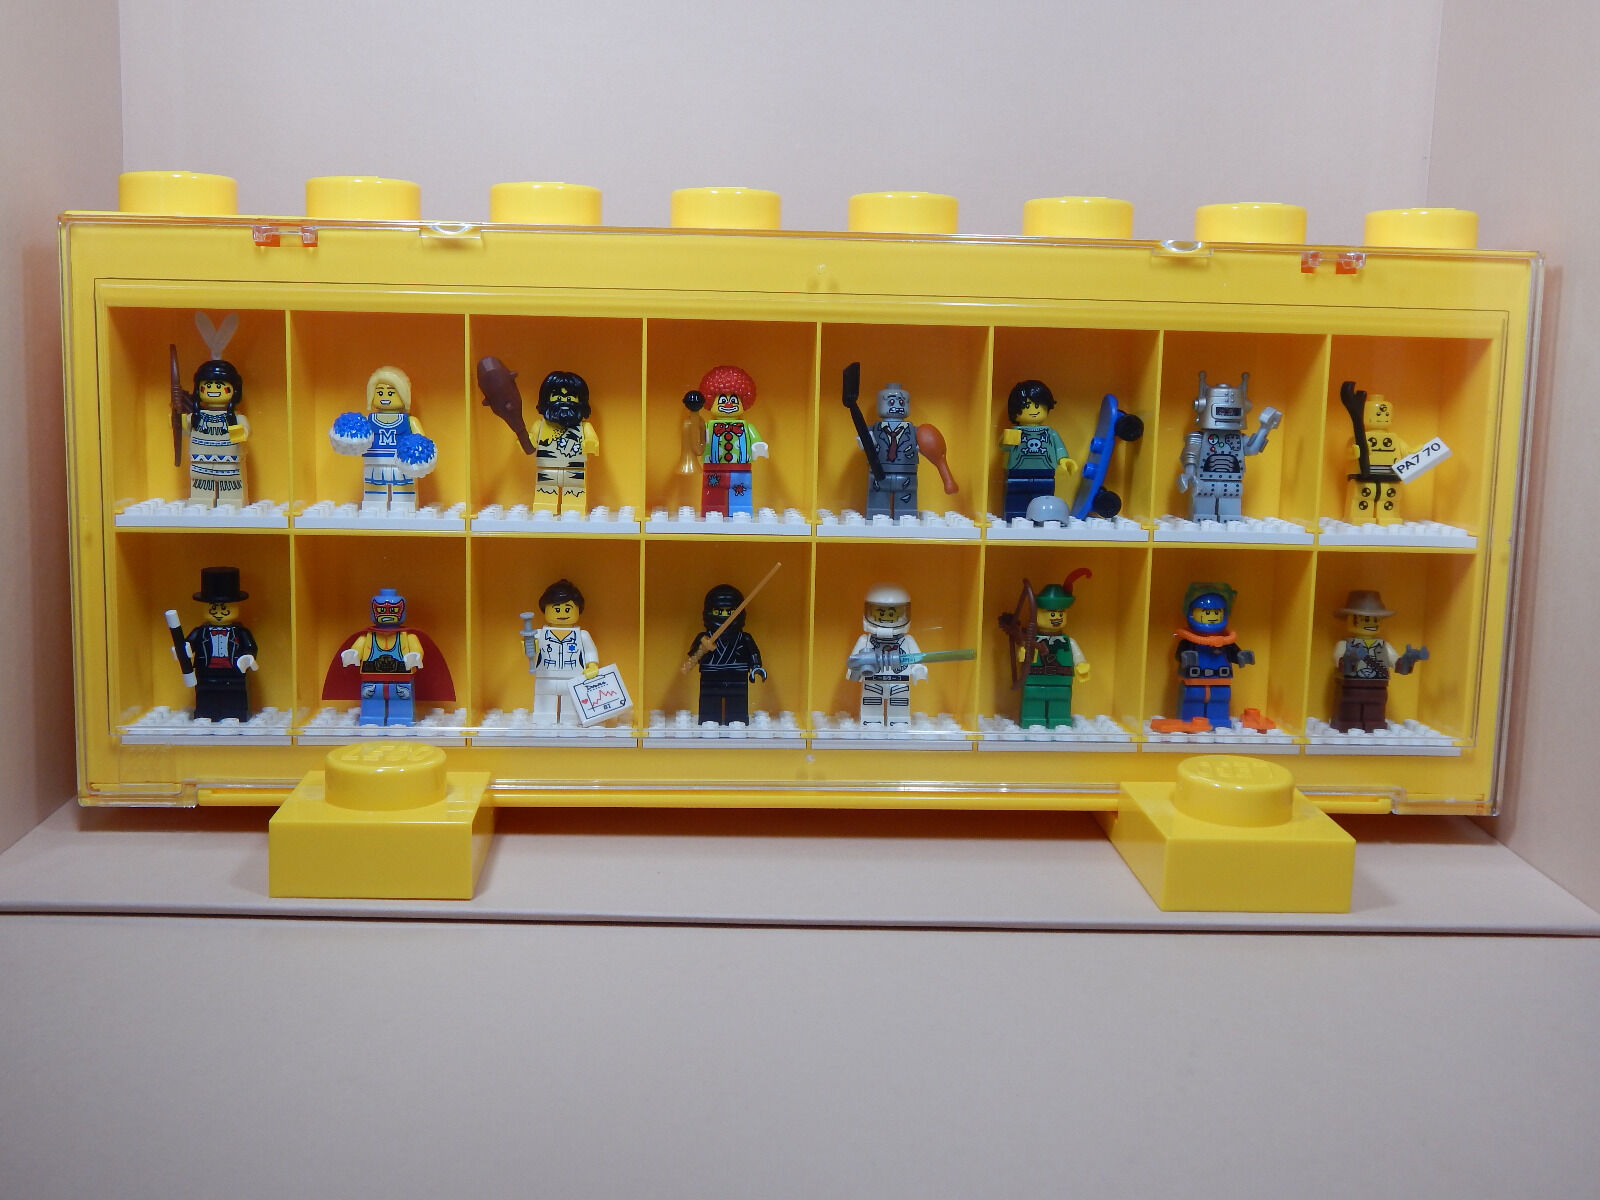 Lego 8683 Komplett-Satz  Minifiguren  Serie 1 + 1 Vitrine